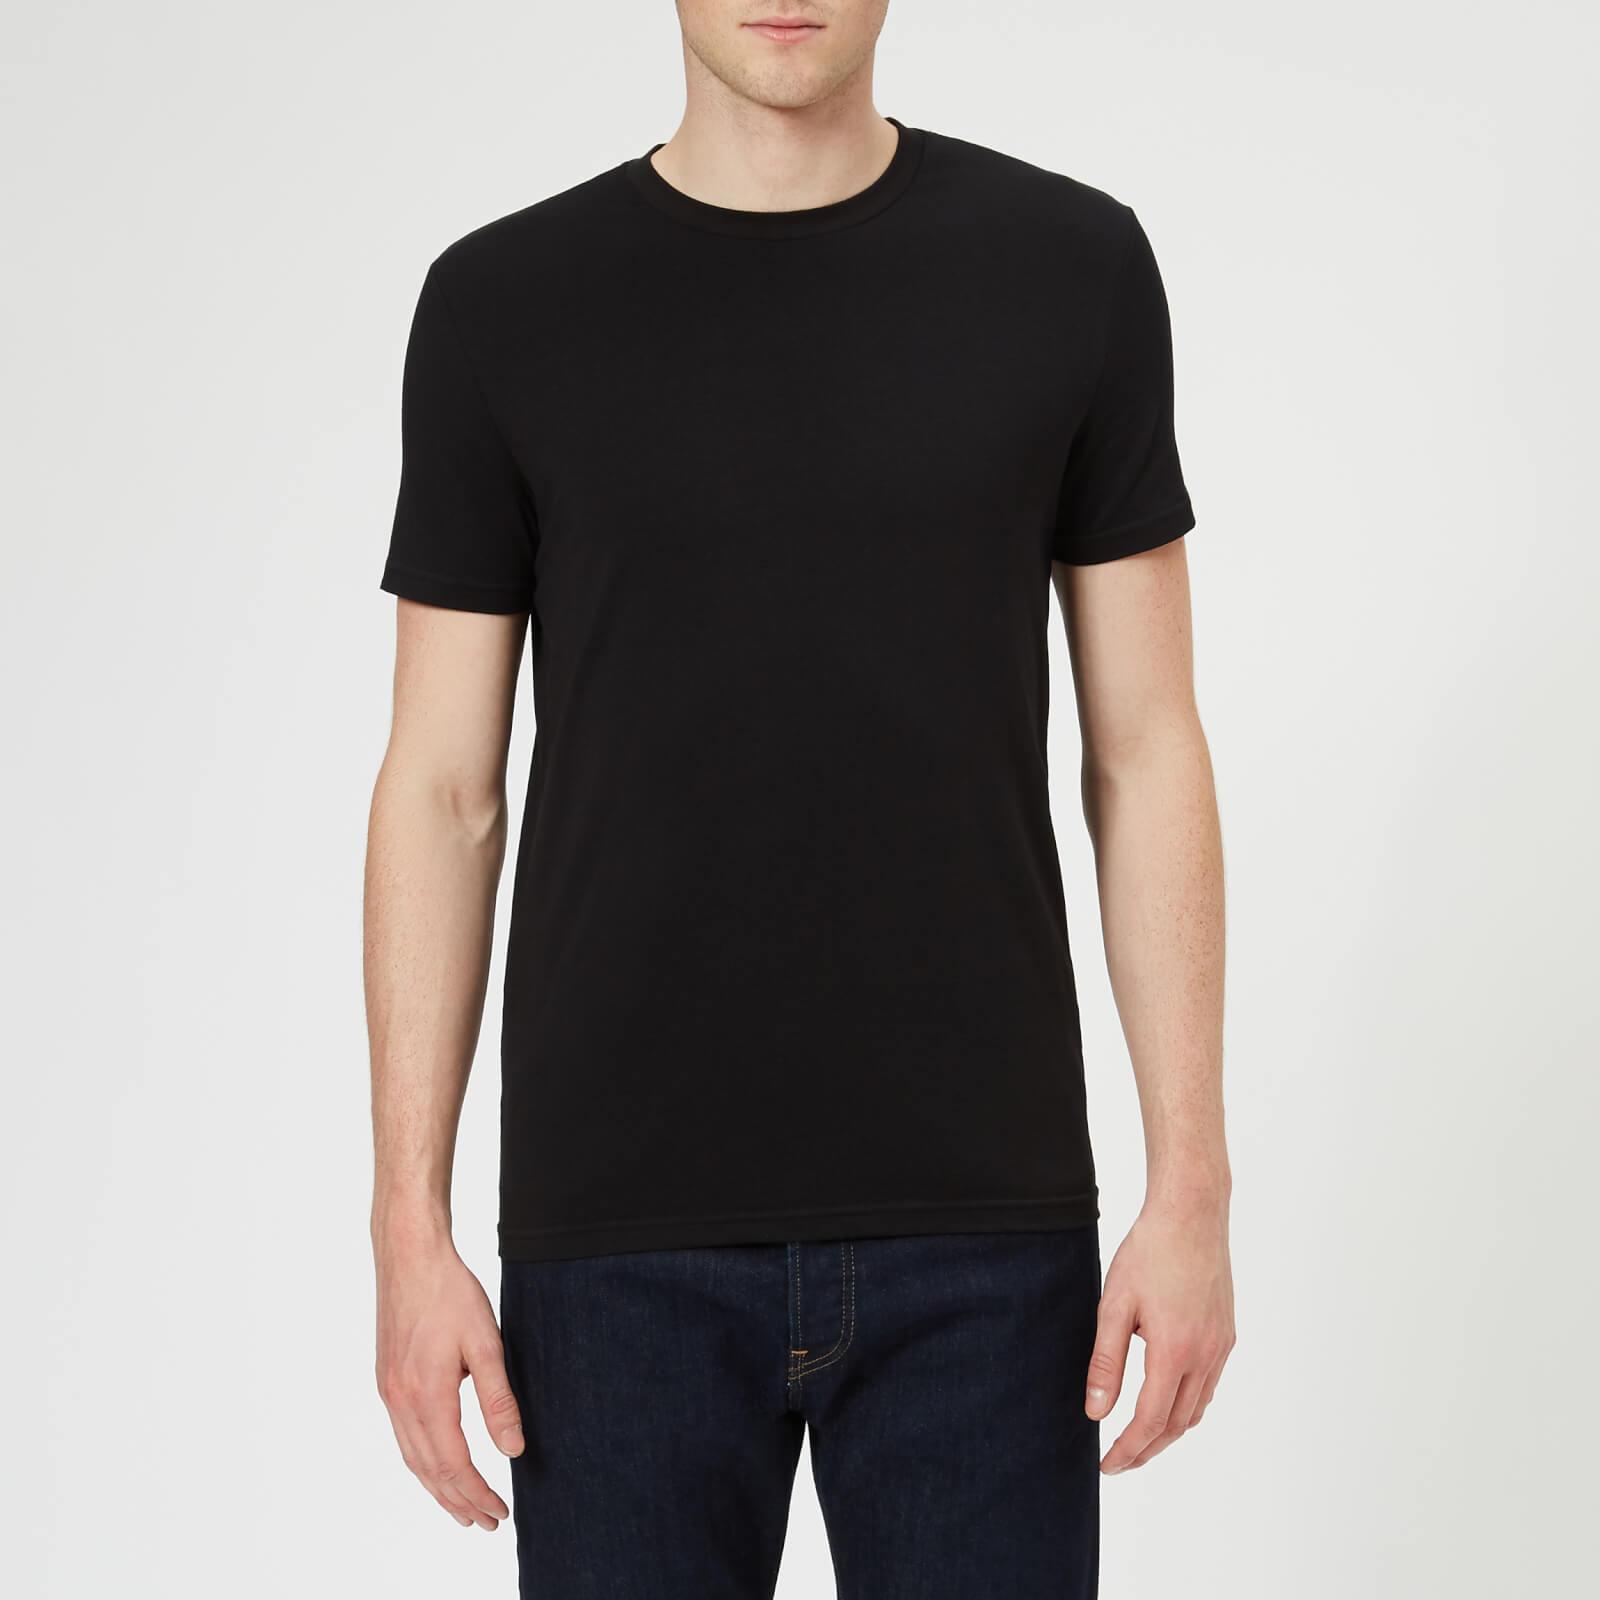 Dsquared2 Men's Twin Pack Crew Neck T-Shirt - Black - XXL - Black